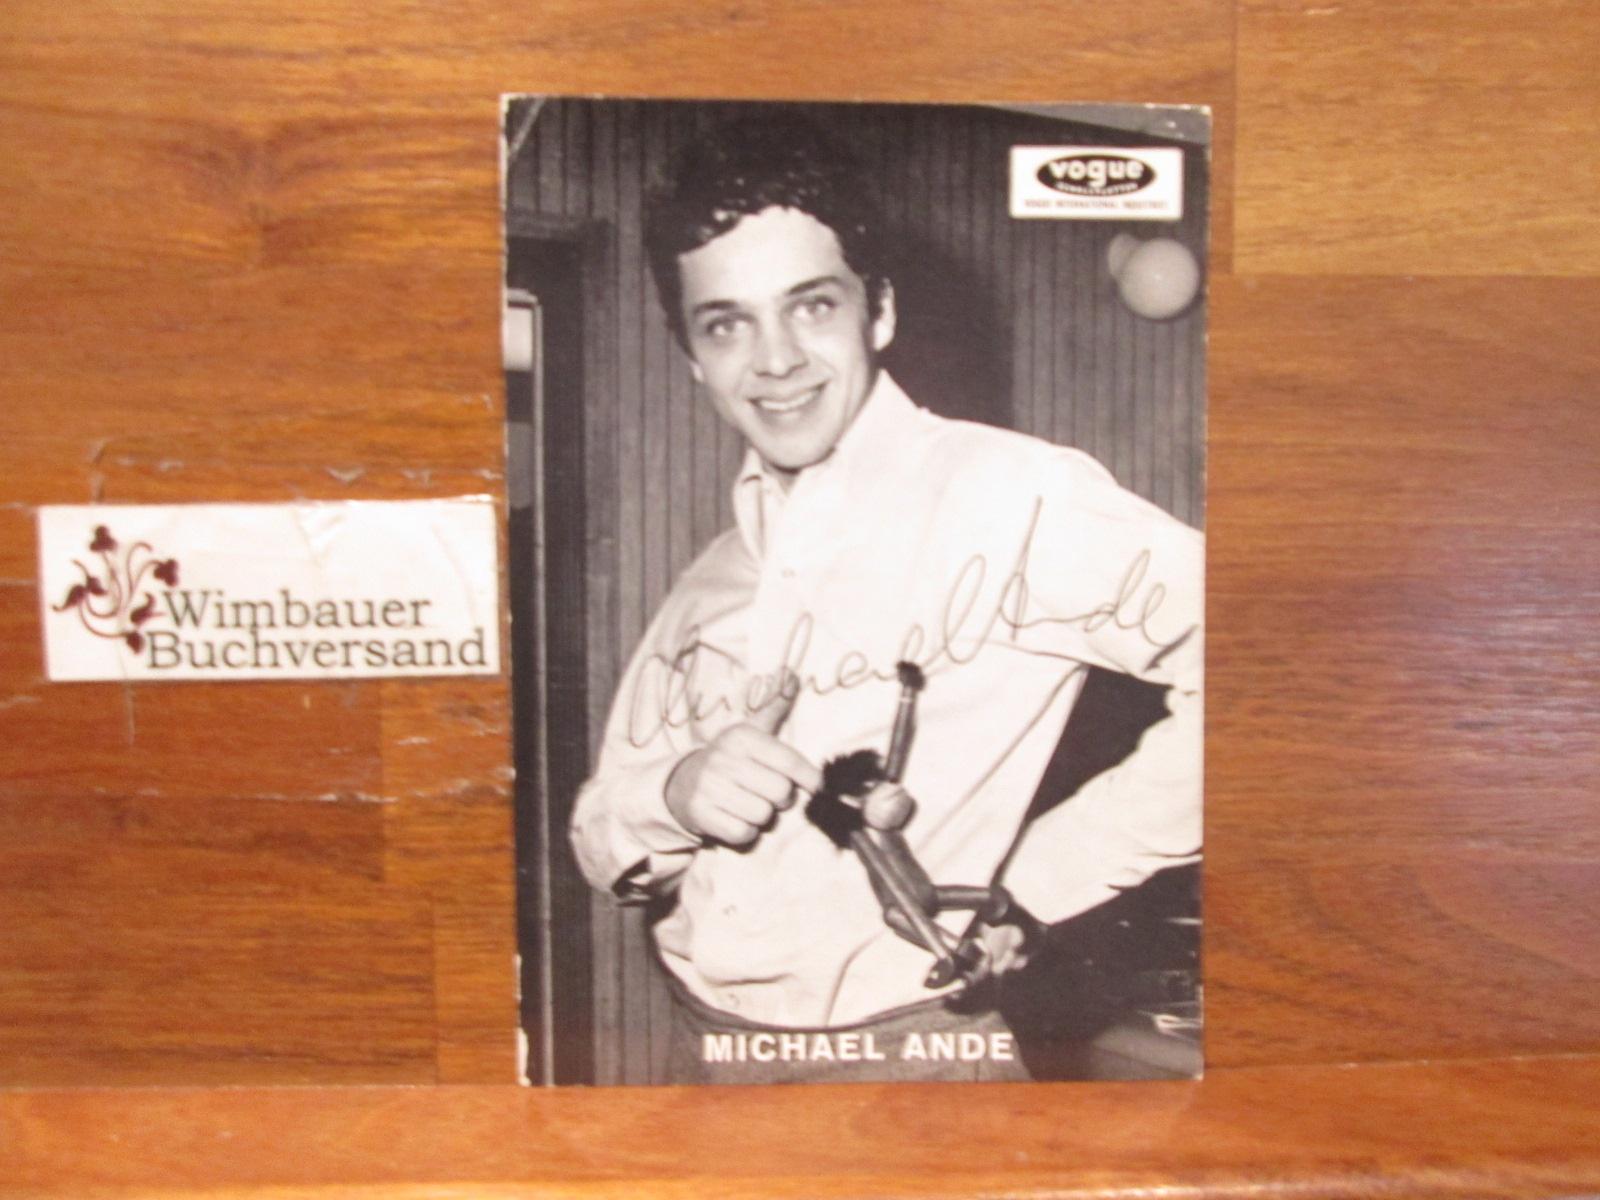 Original Autogramm Michael Ande /// Autogramm Autograph signiert signed signee